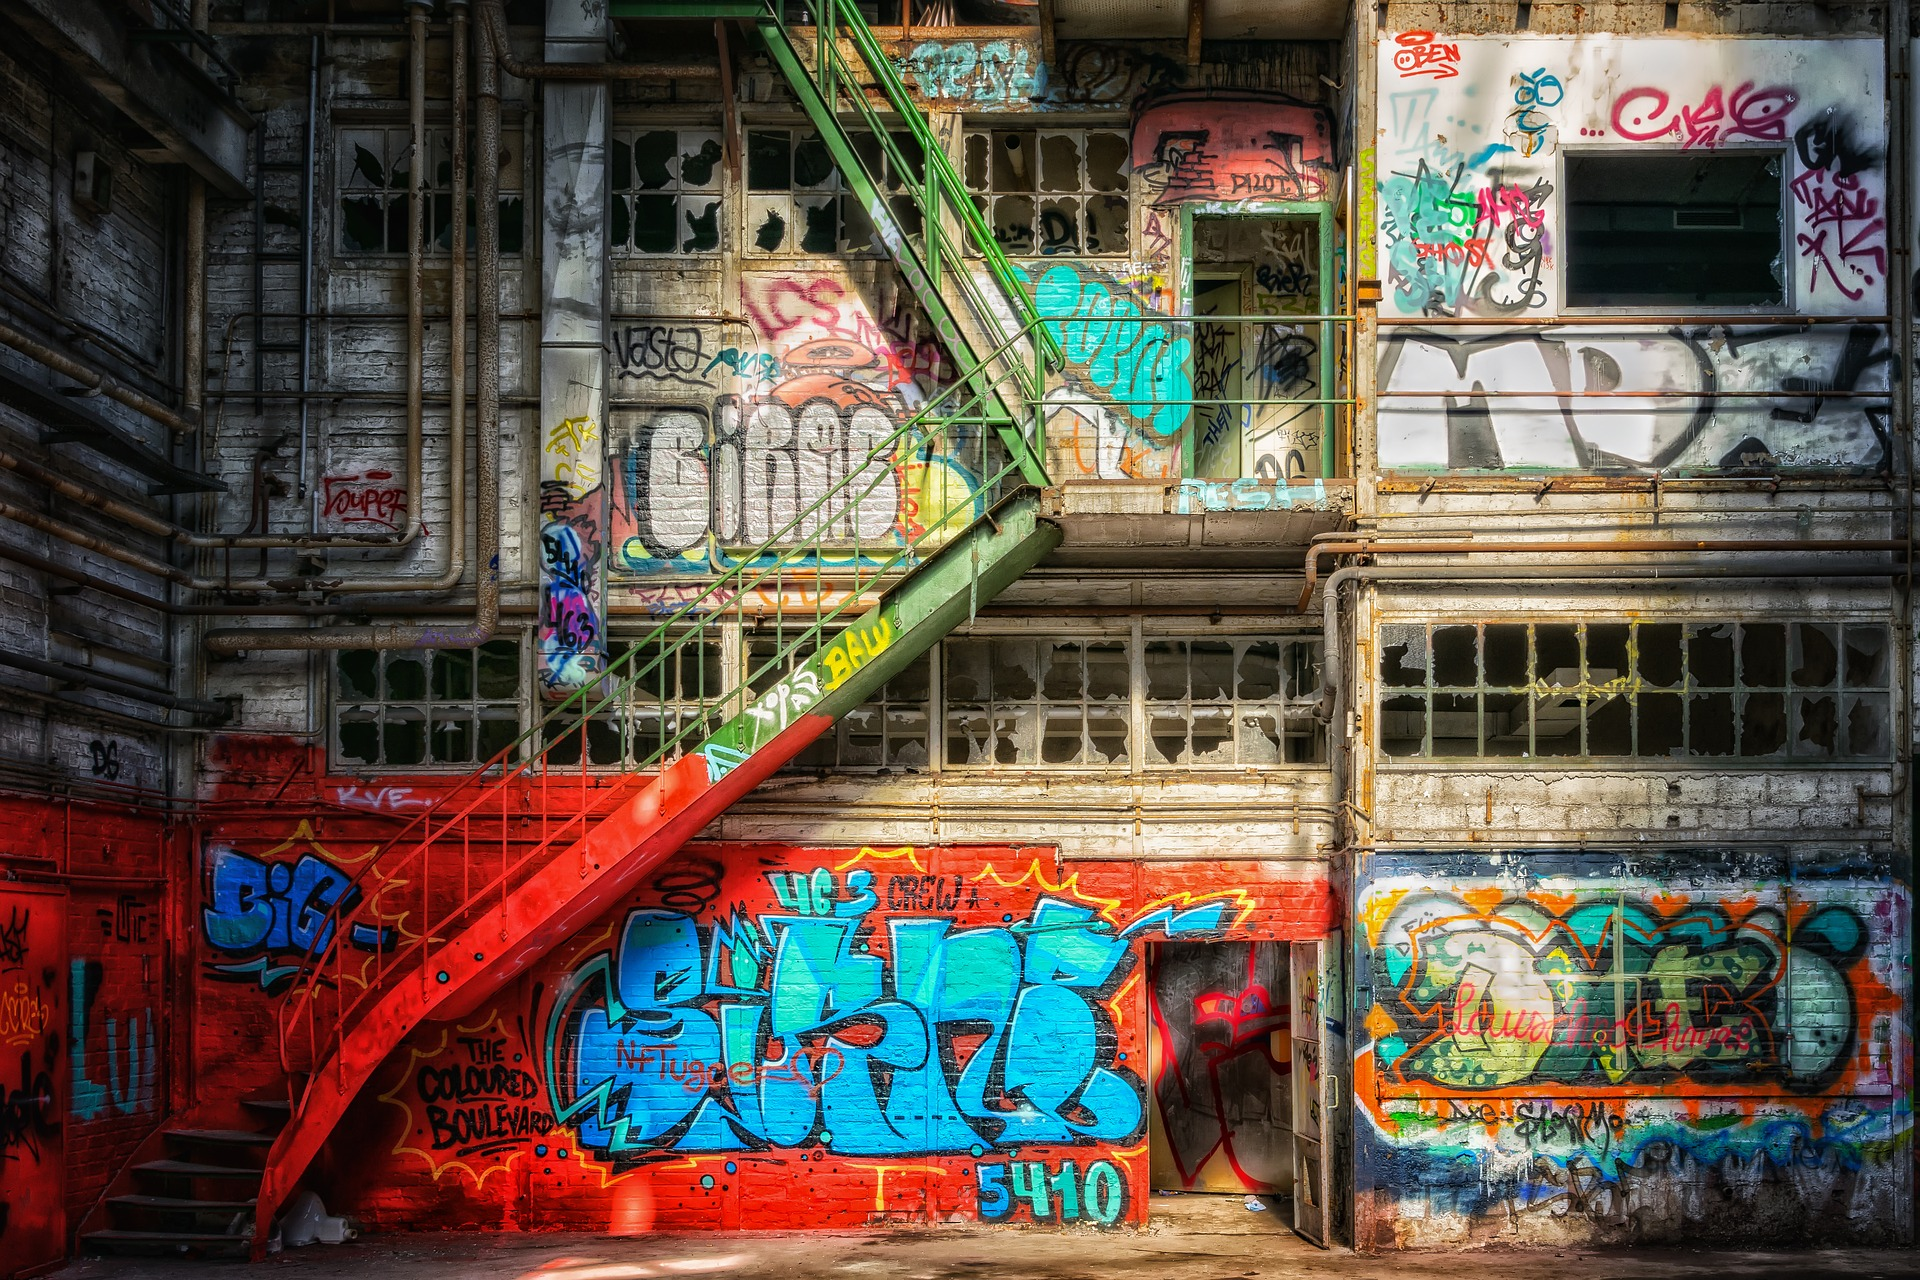 Translating Graffiti